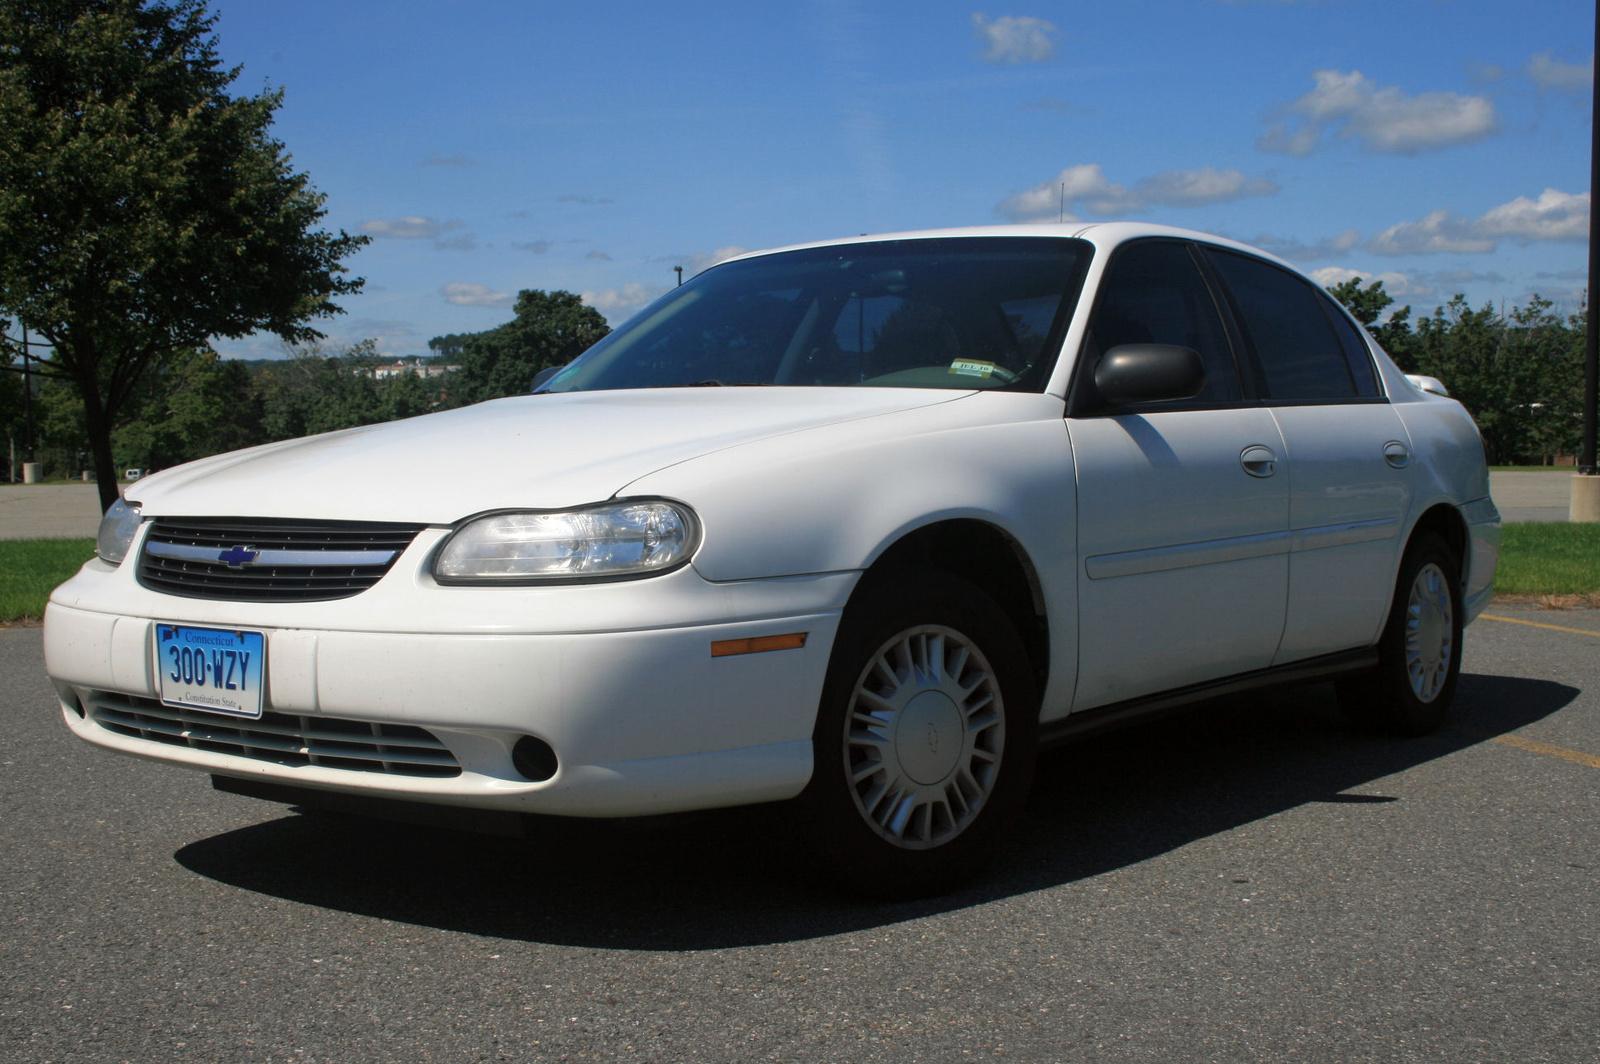 Chevrolet Chevy 2001 foto - 2